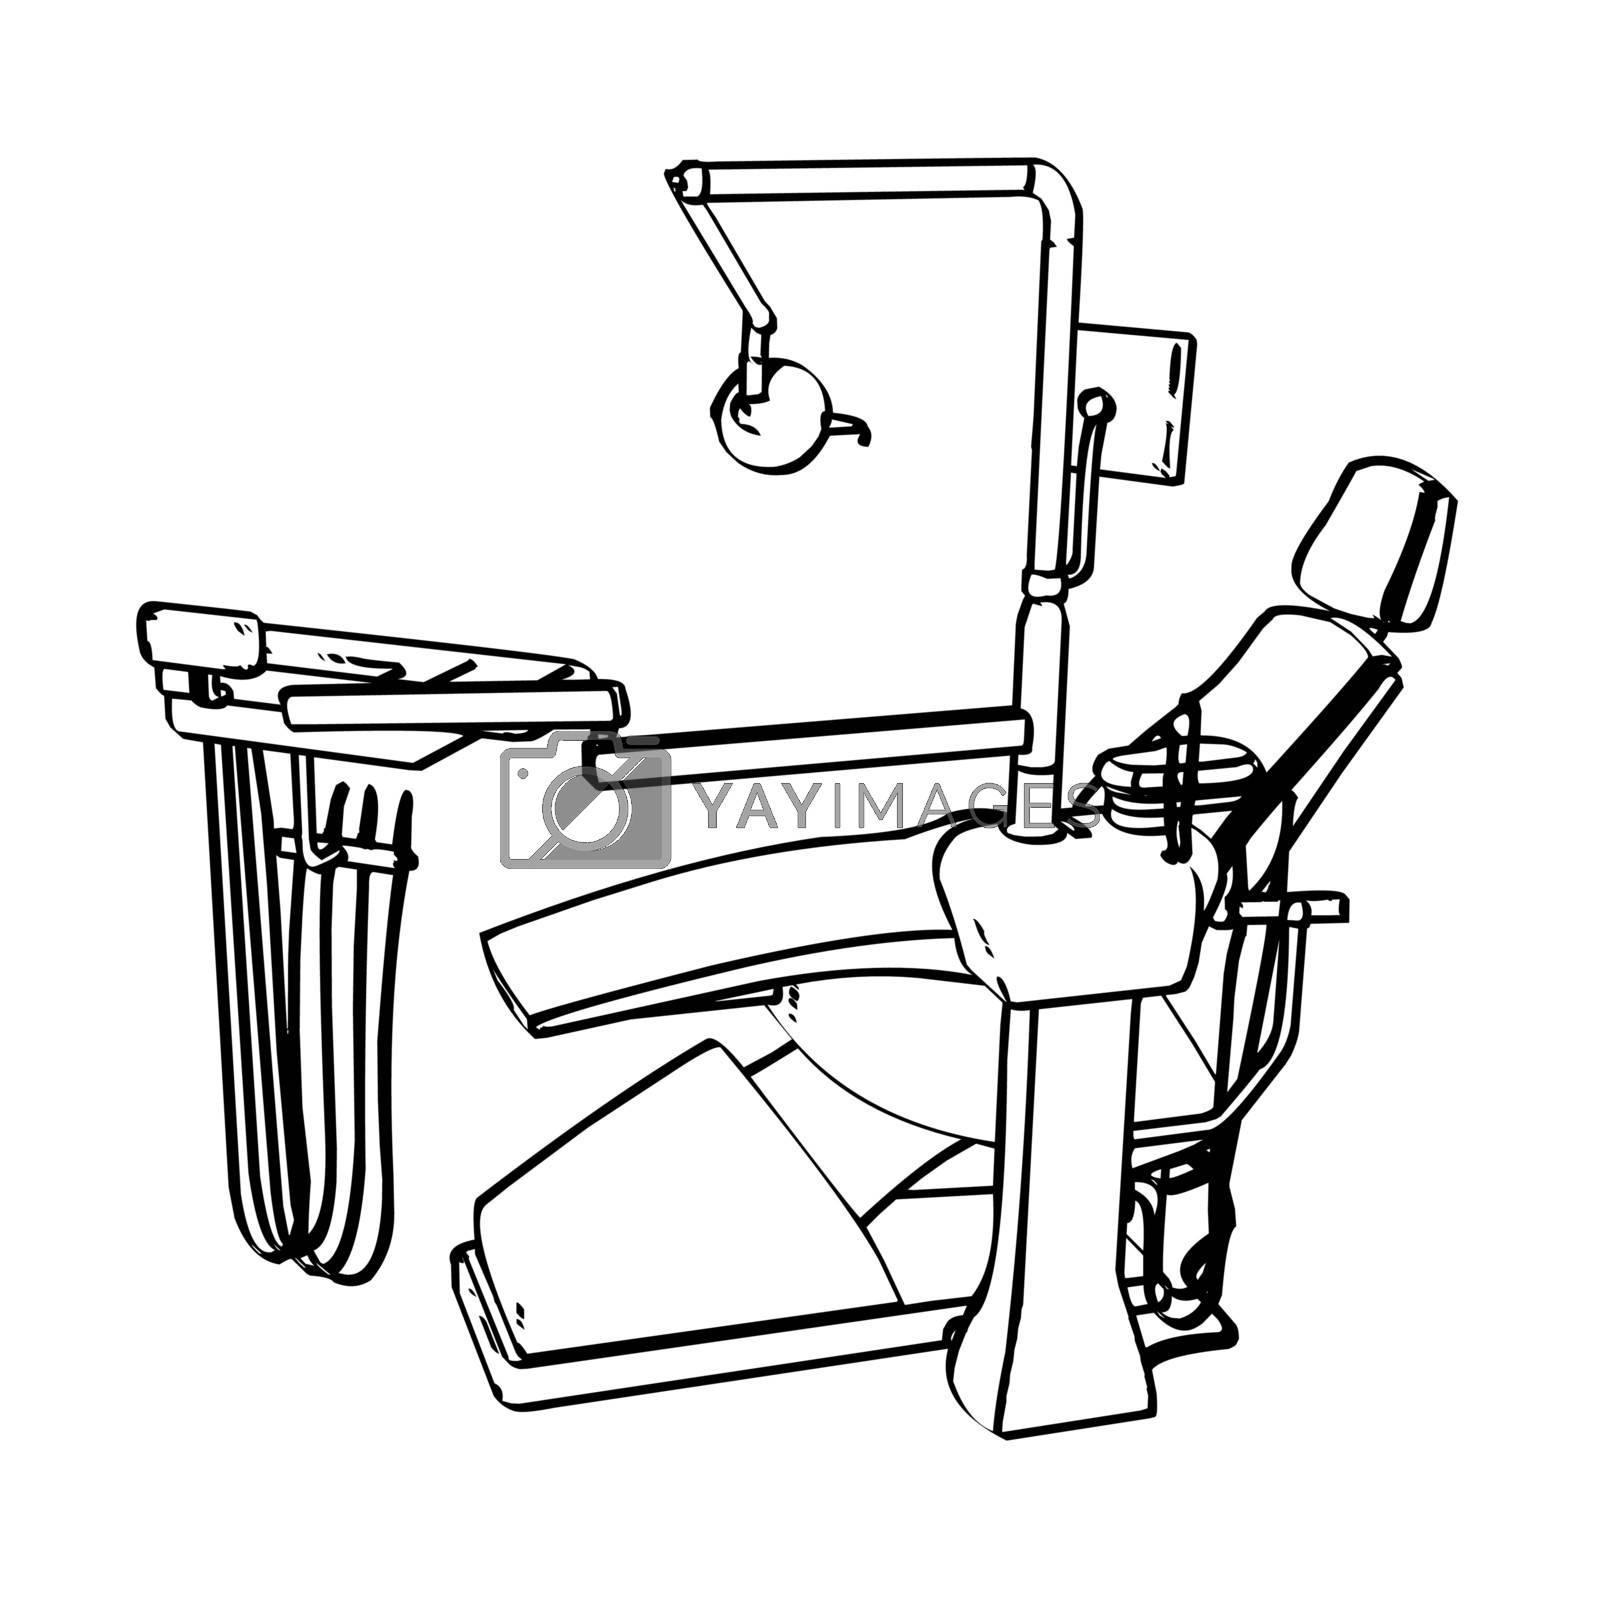 Dentist's drill chair engraving sketch. Vector illustration.